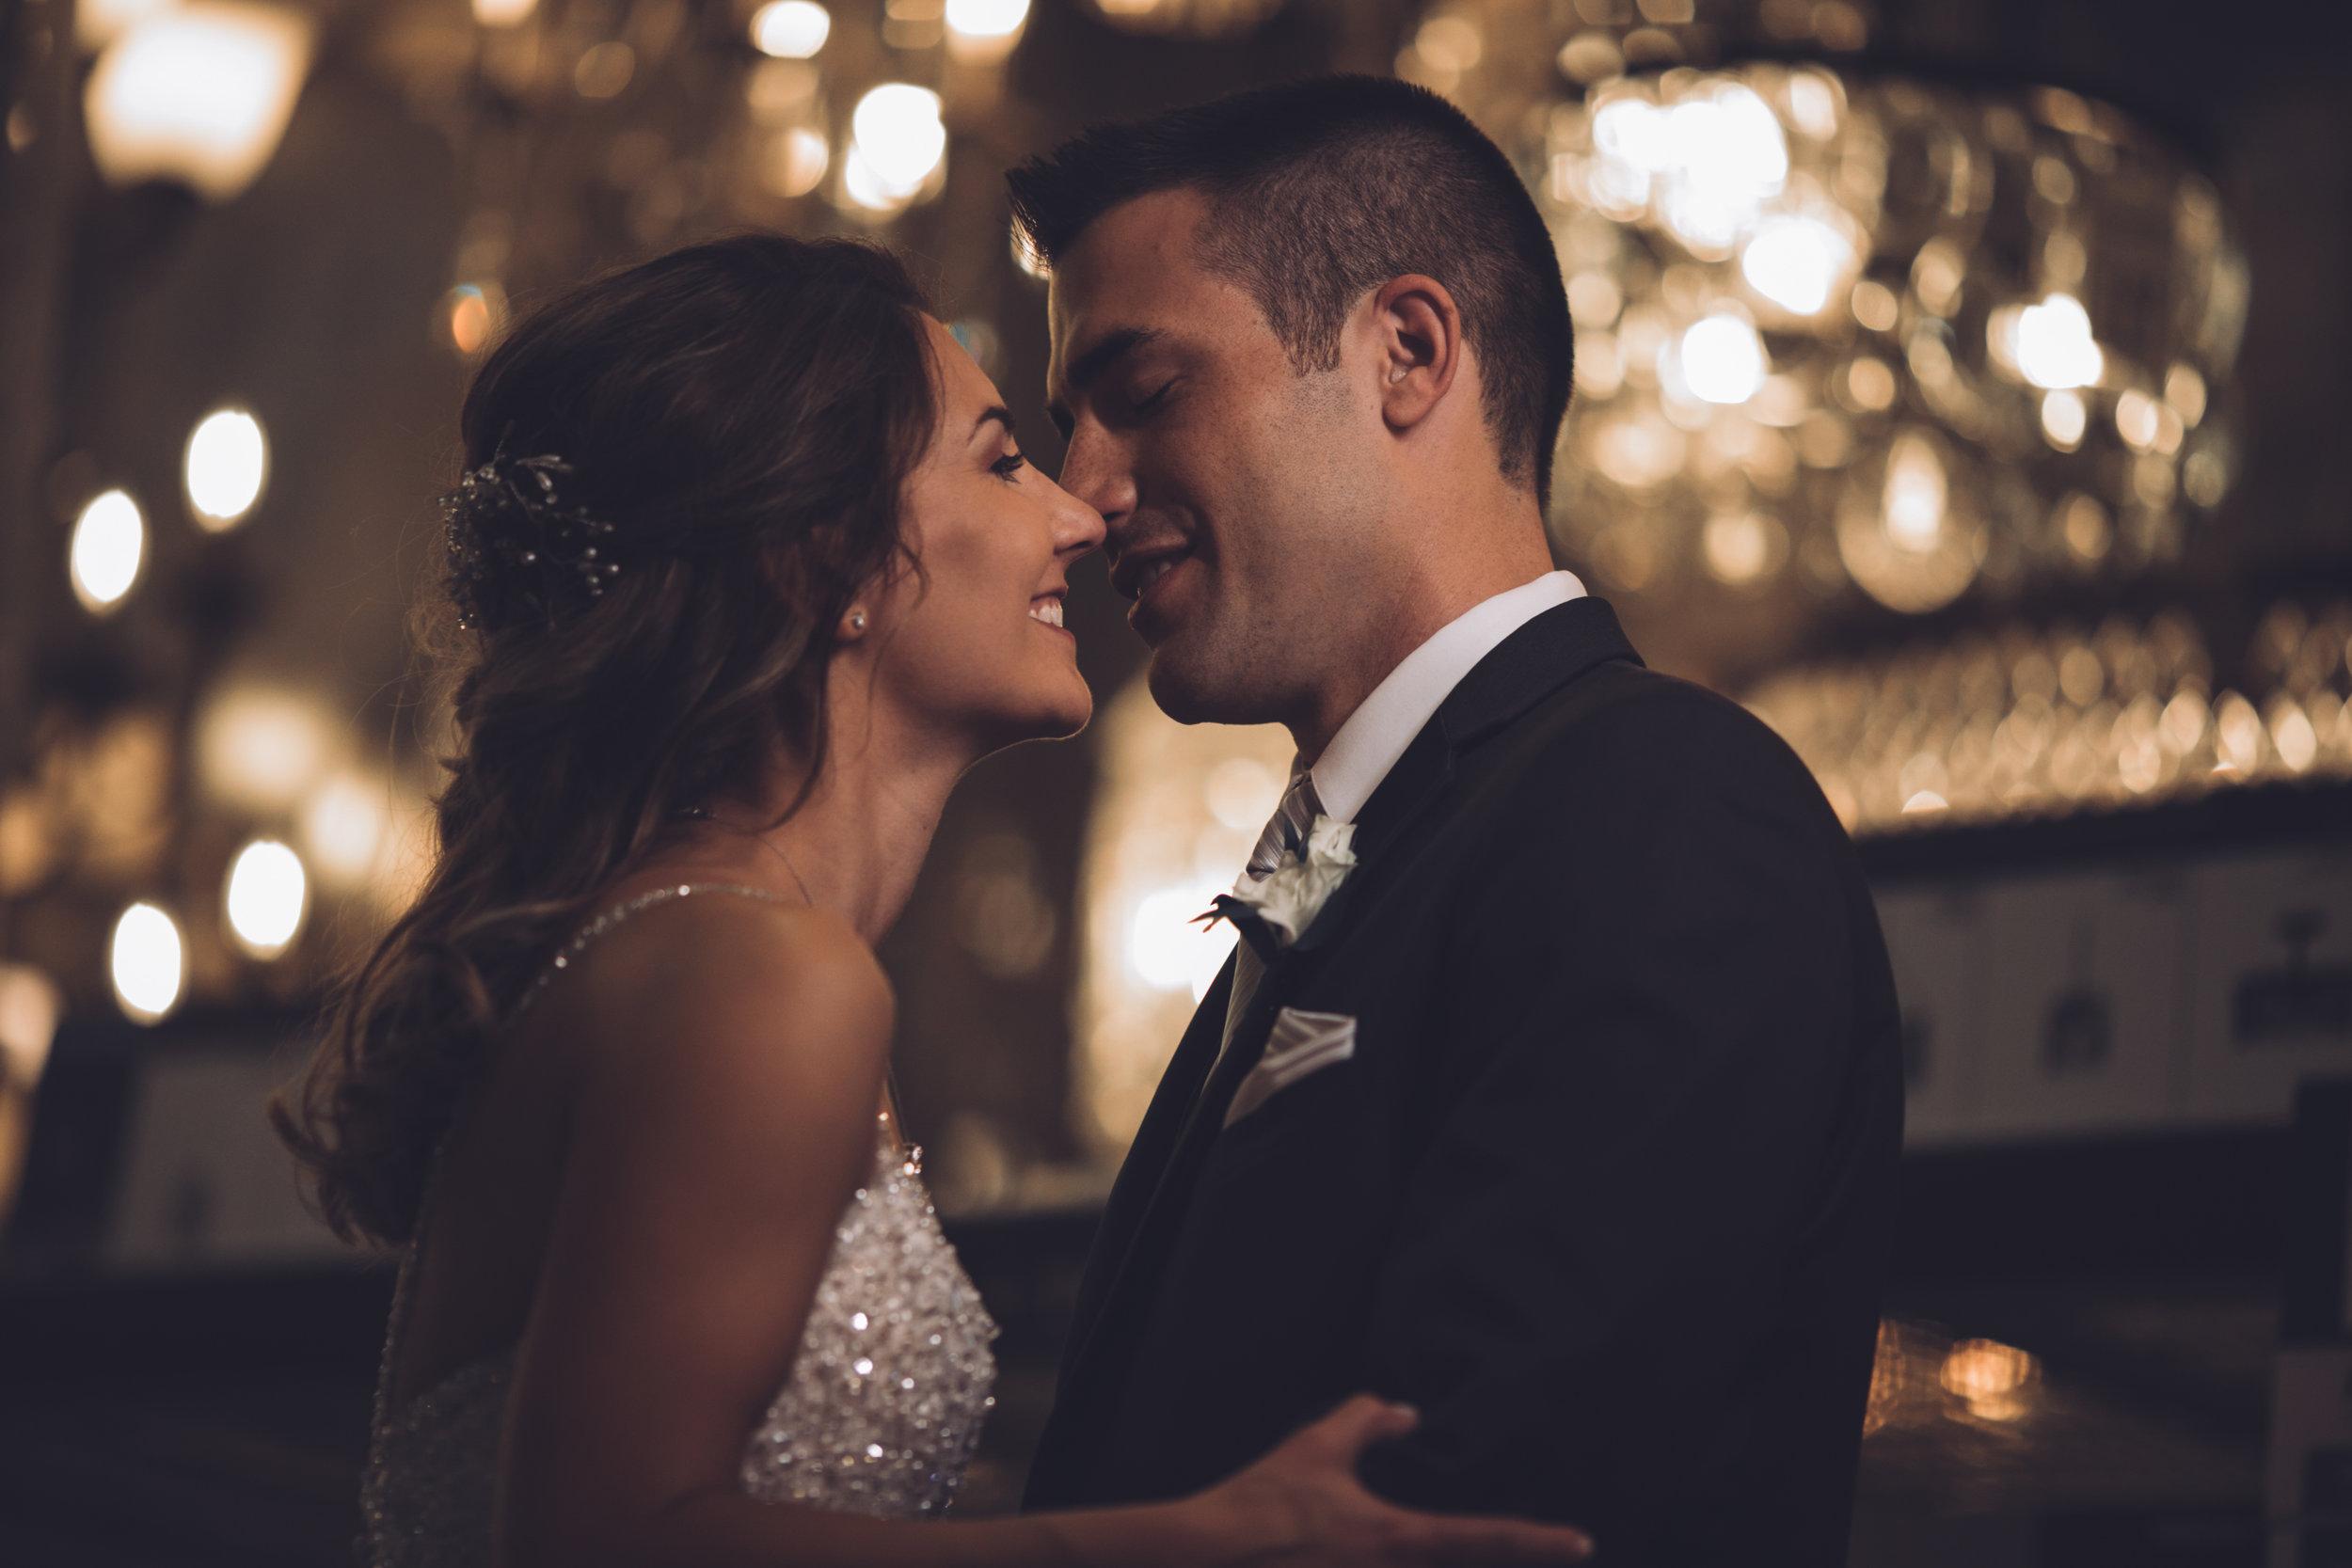 Wedding-couple-takes-photos-at-lowes-hardware-due-to-rain8.jpg